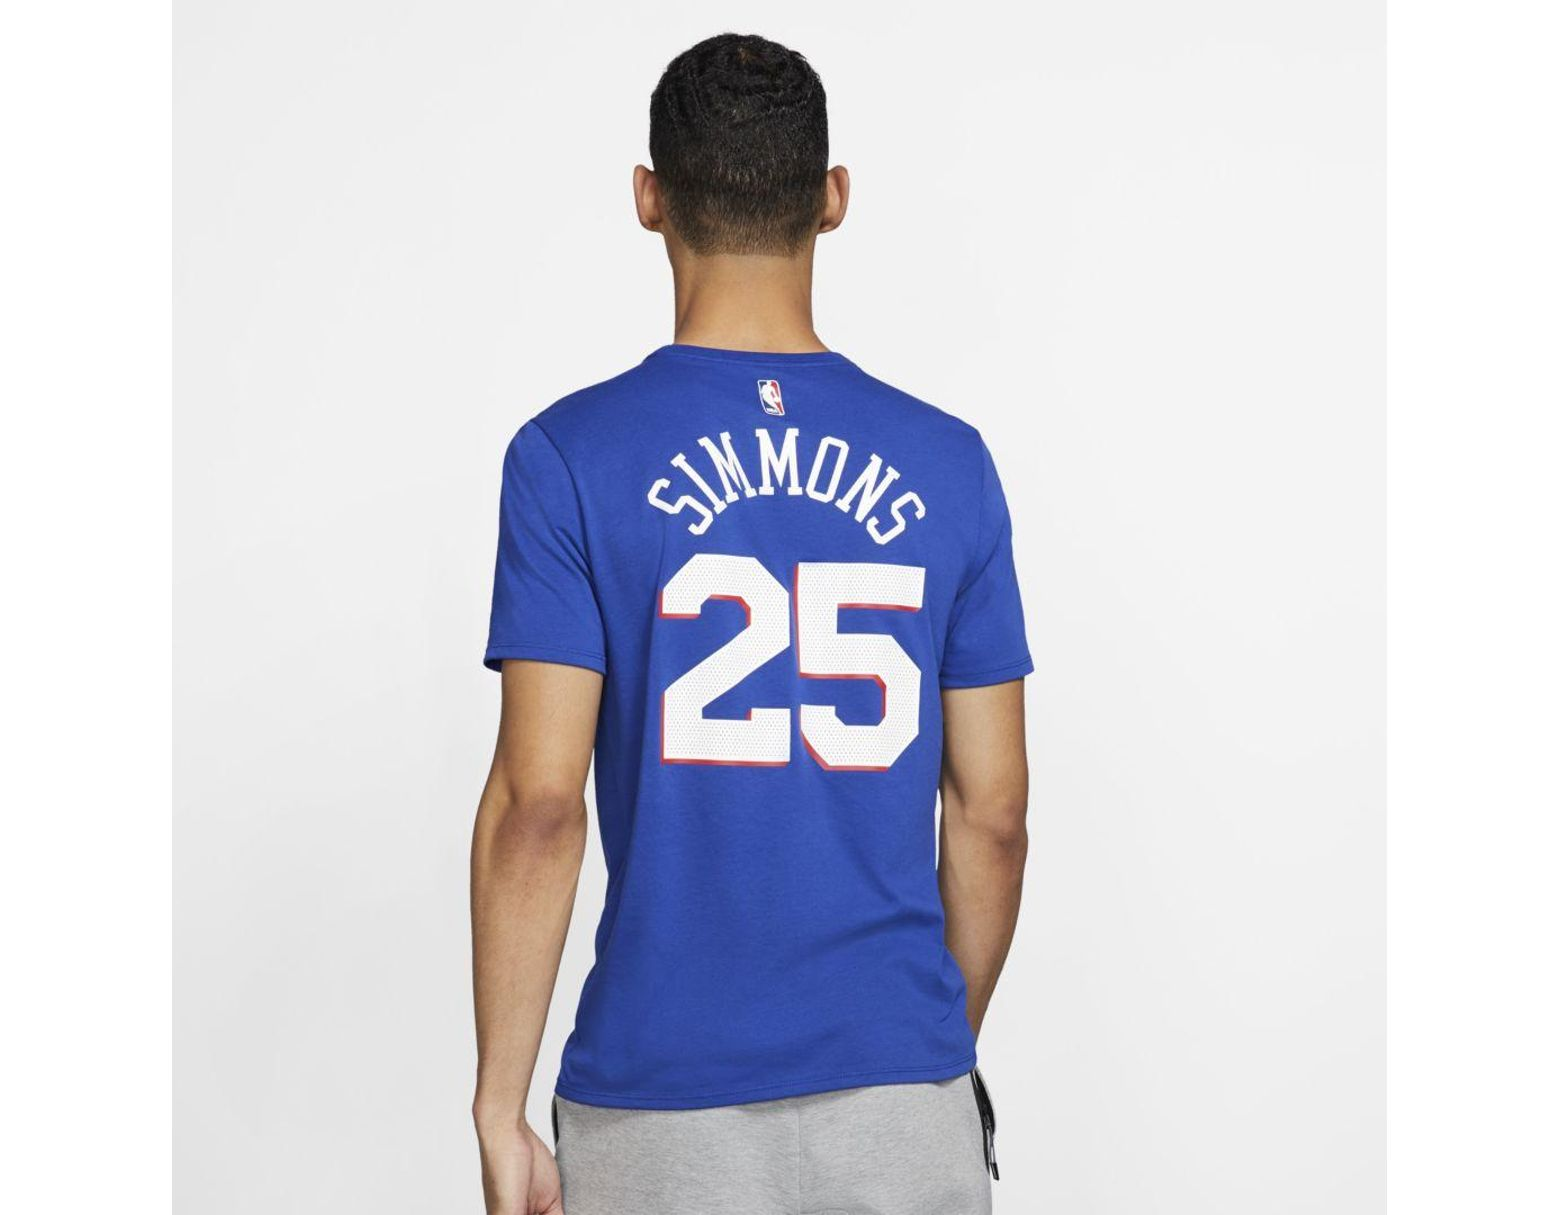 86334a8367e Nike Ben Simmons Philadelphia 76ers Dri-fit Nba T-shirt in Blue for Men -  Lyst